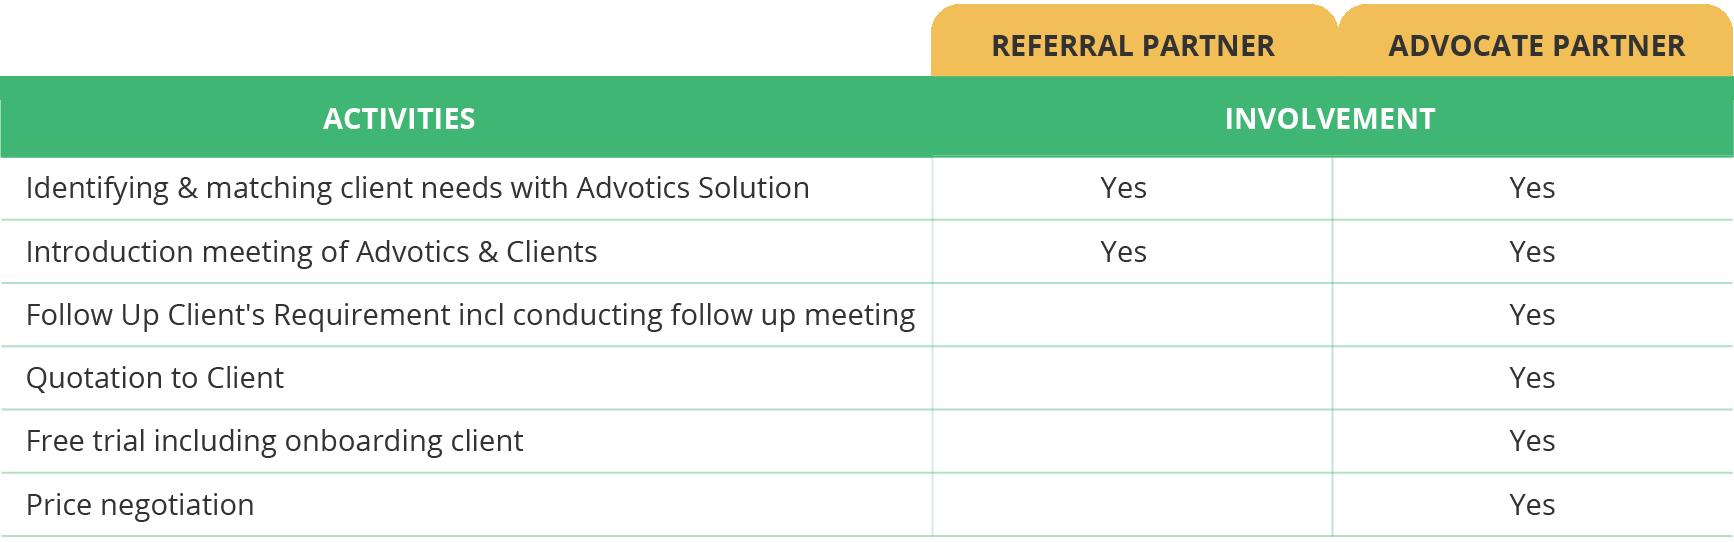 partnership bagan referal